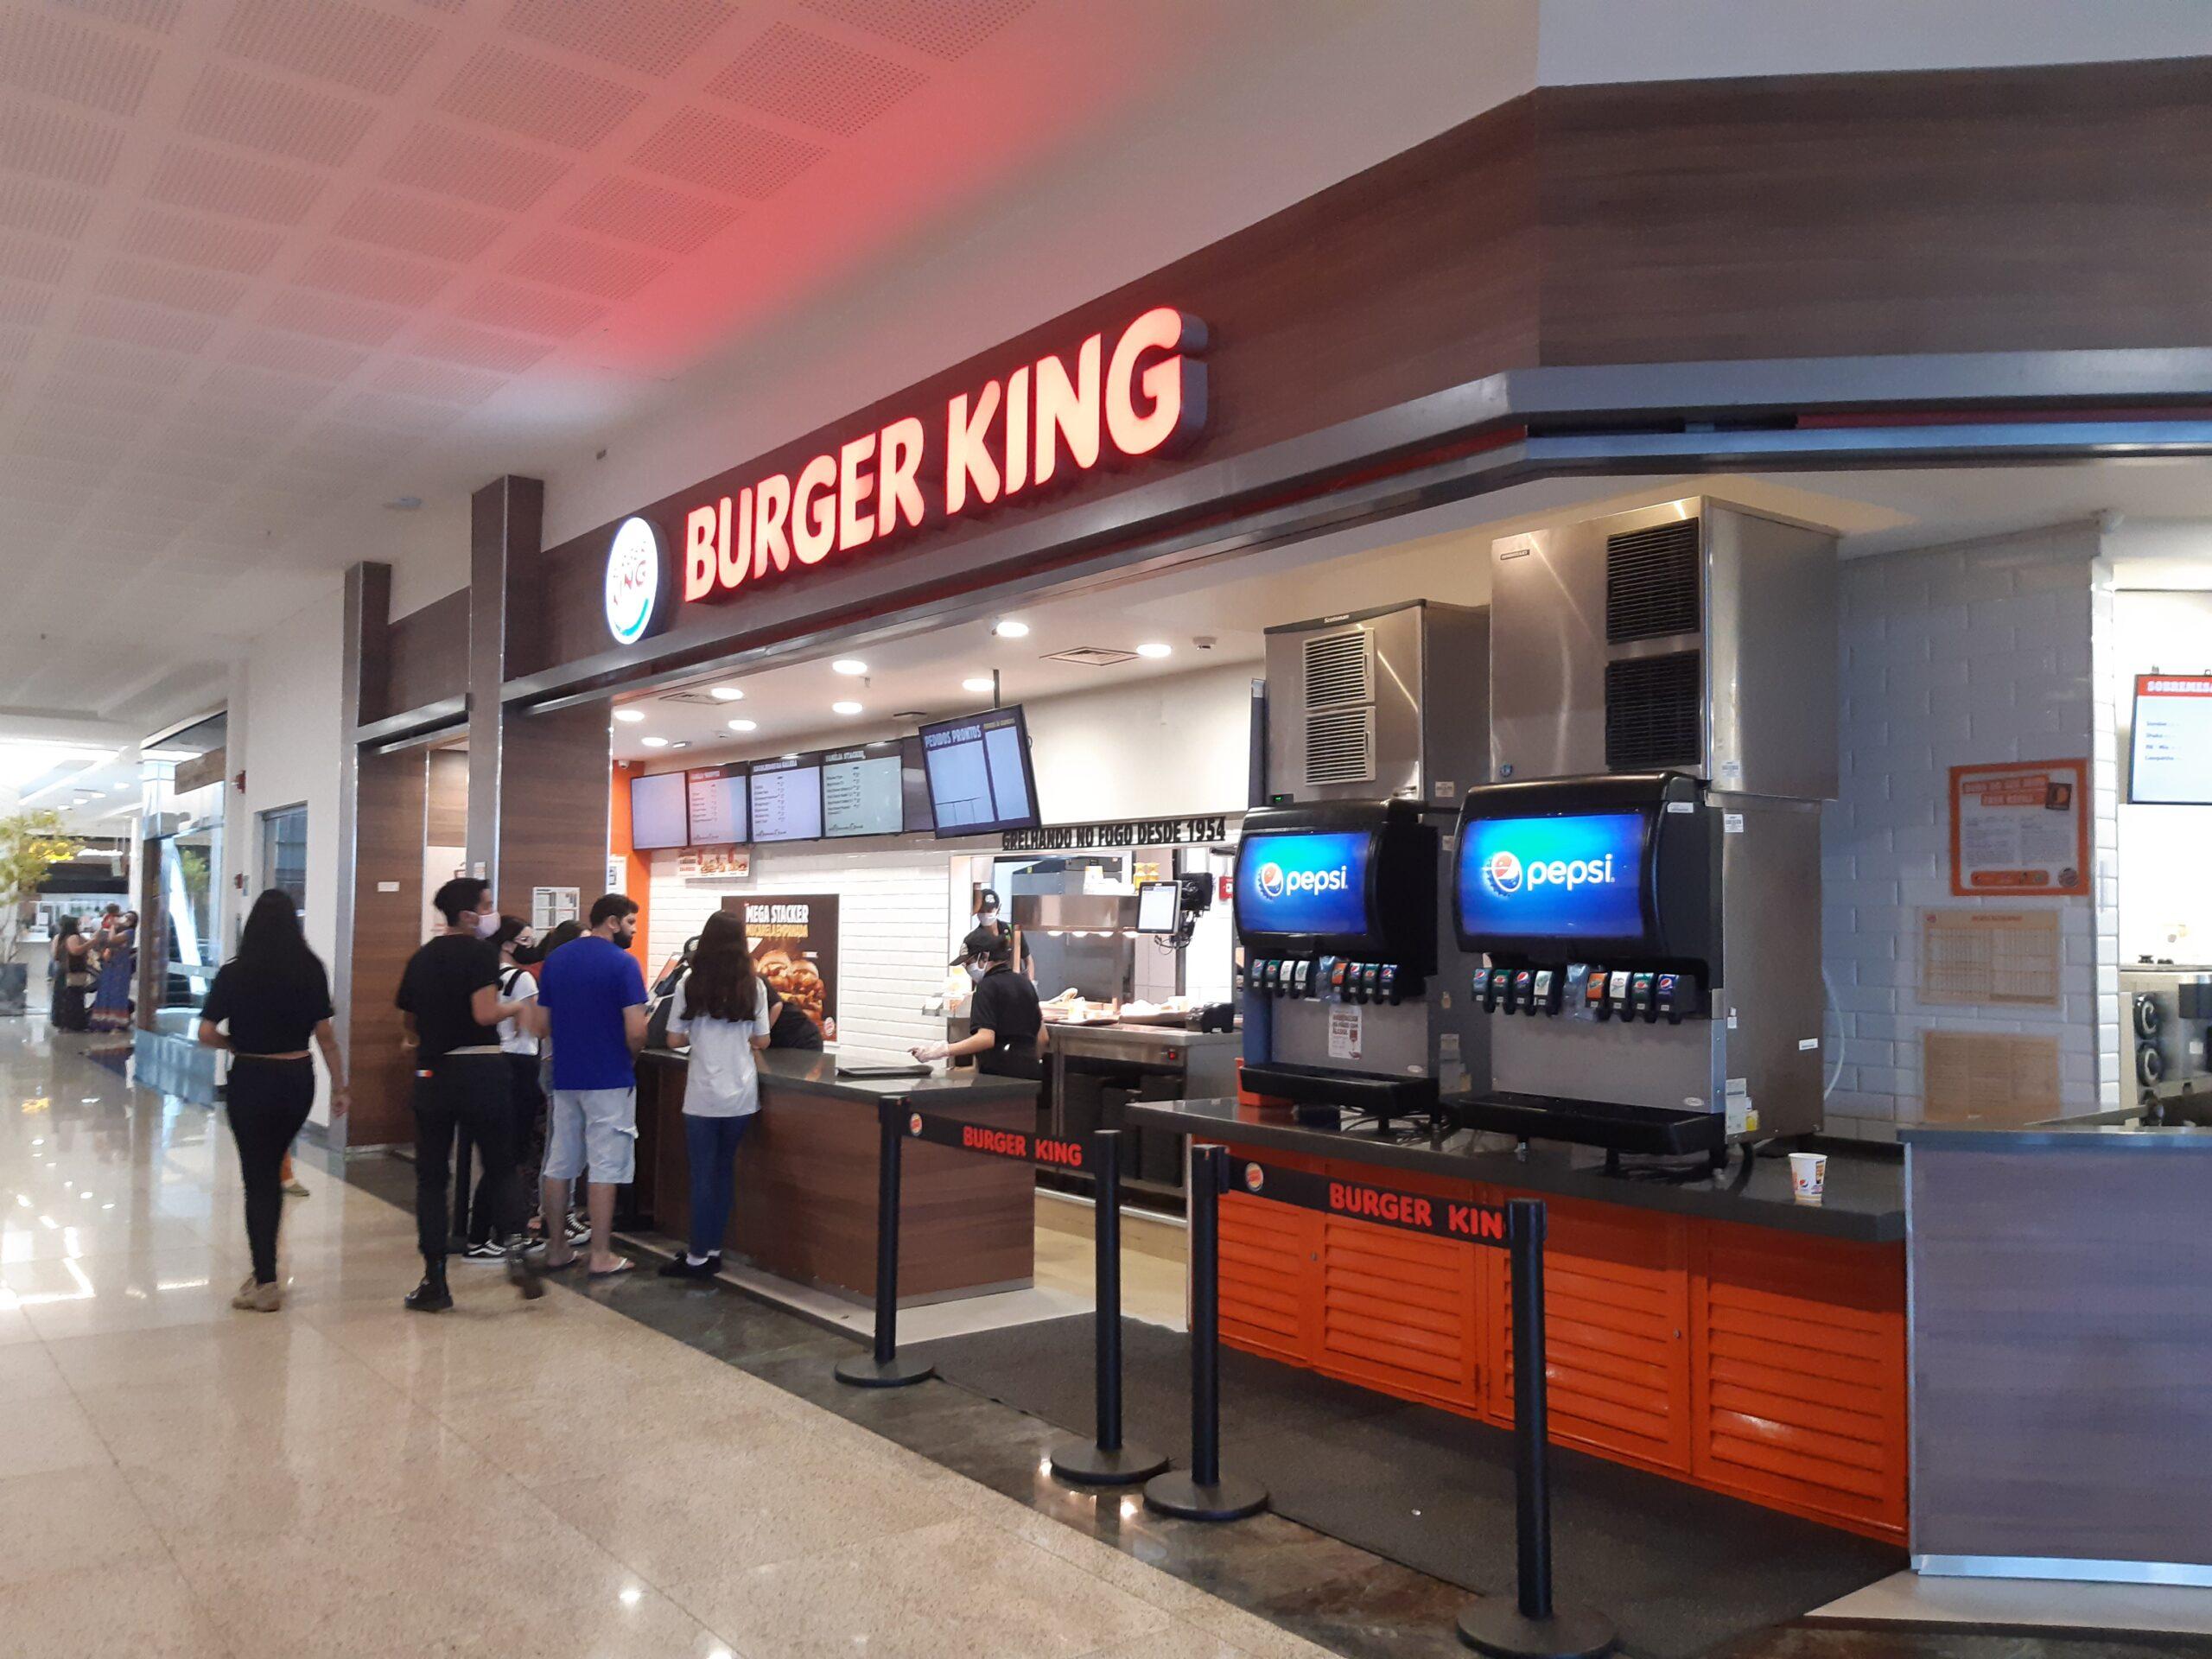 Burger King do Taguatinga Shopping, Comércio Brasilia